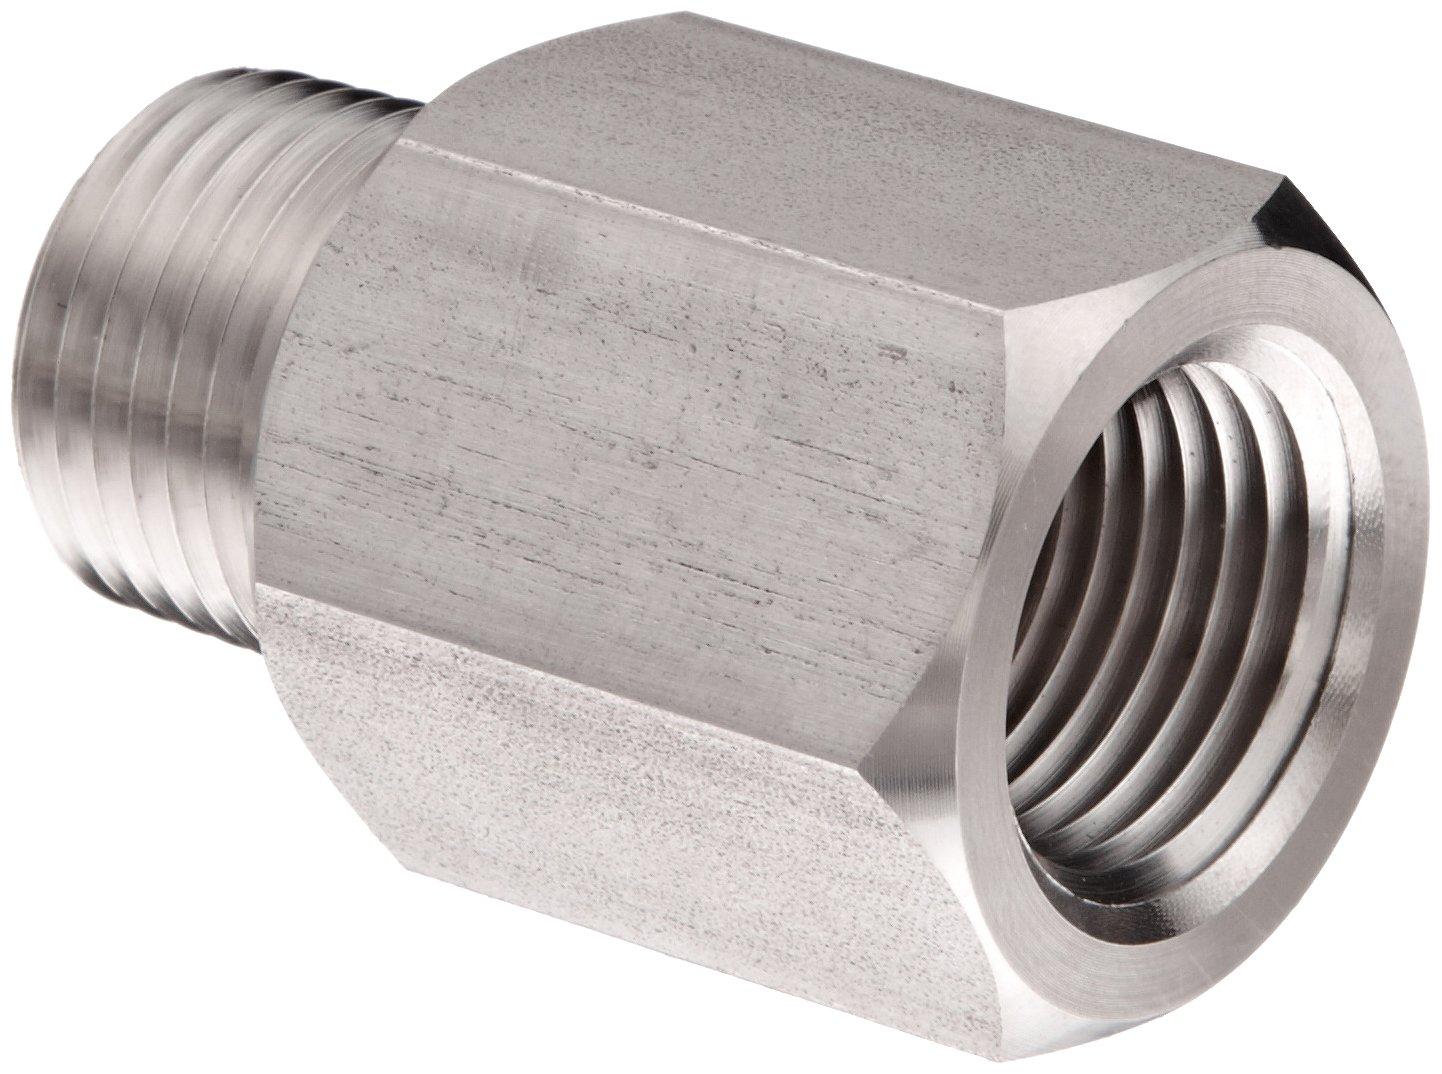 15000 psi Pressure Range NOSHOK 5125 316 Stainless Steel Sintered Pressure Snubber with Grade C Disc 1//4 NPT Male